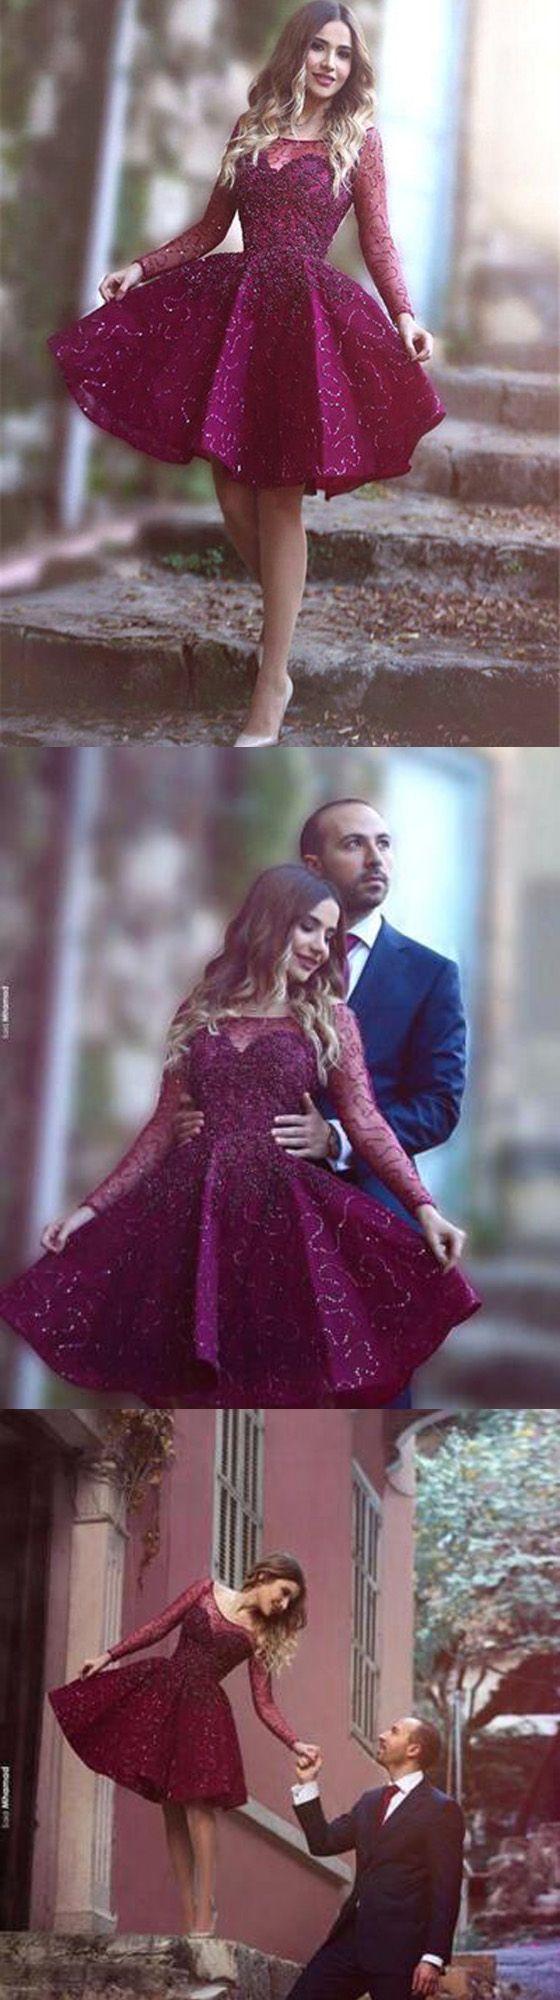 best prom dresses online images on pinterest casamento cute